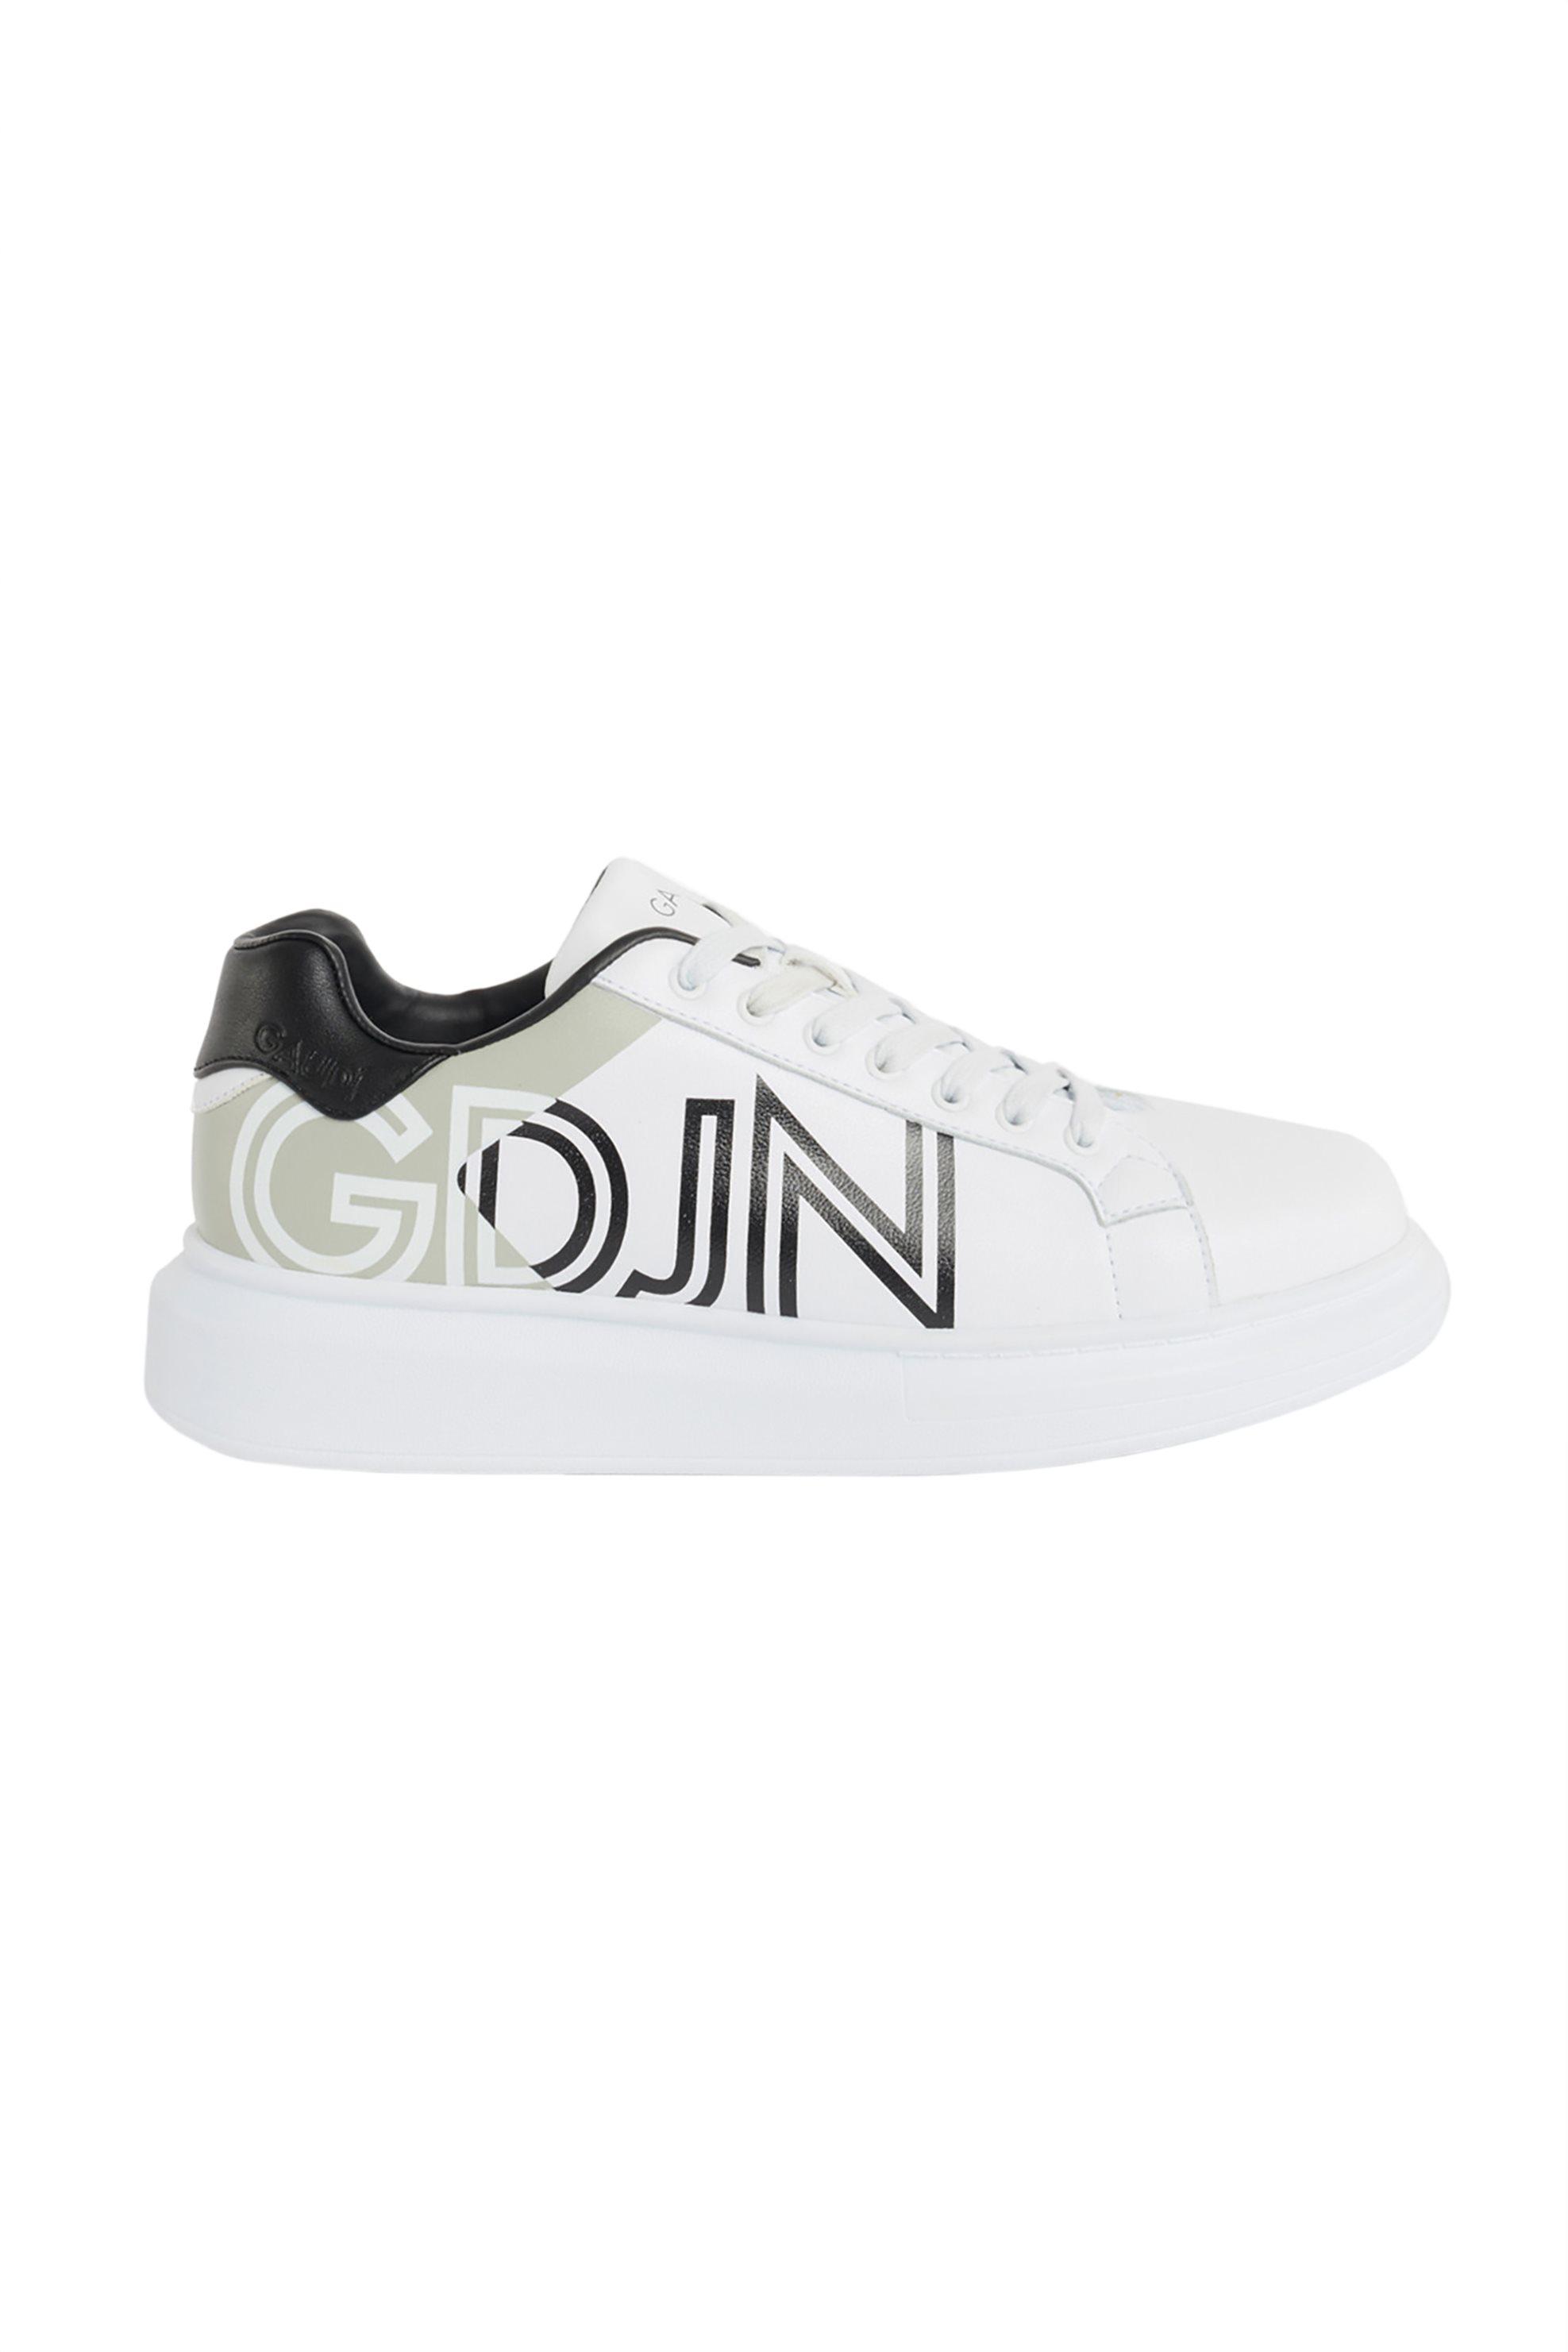 Gaudi ανδρικά sneakers με logo print – V11-61472 – Λευκό